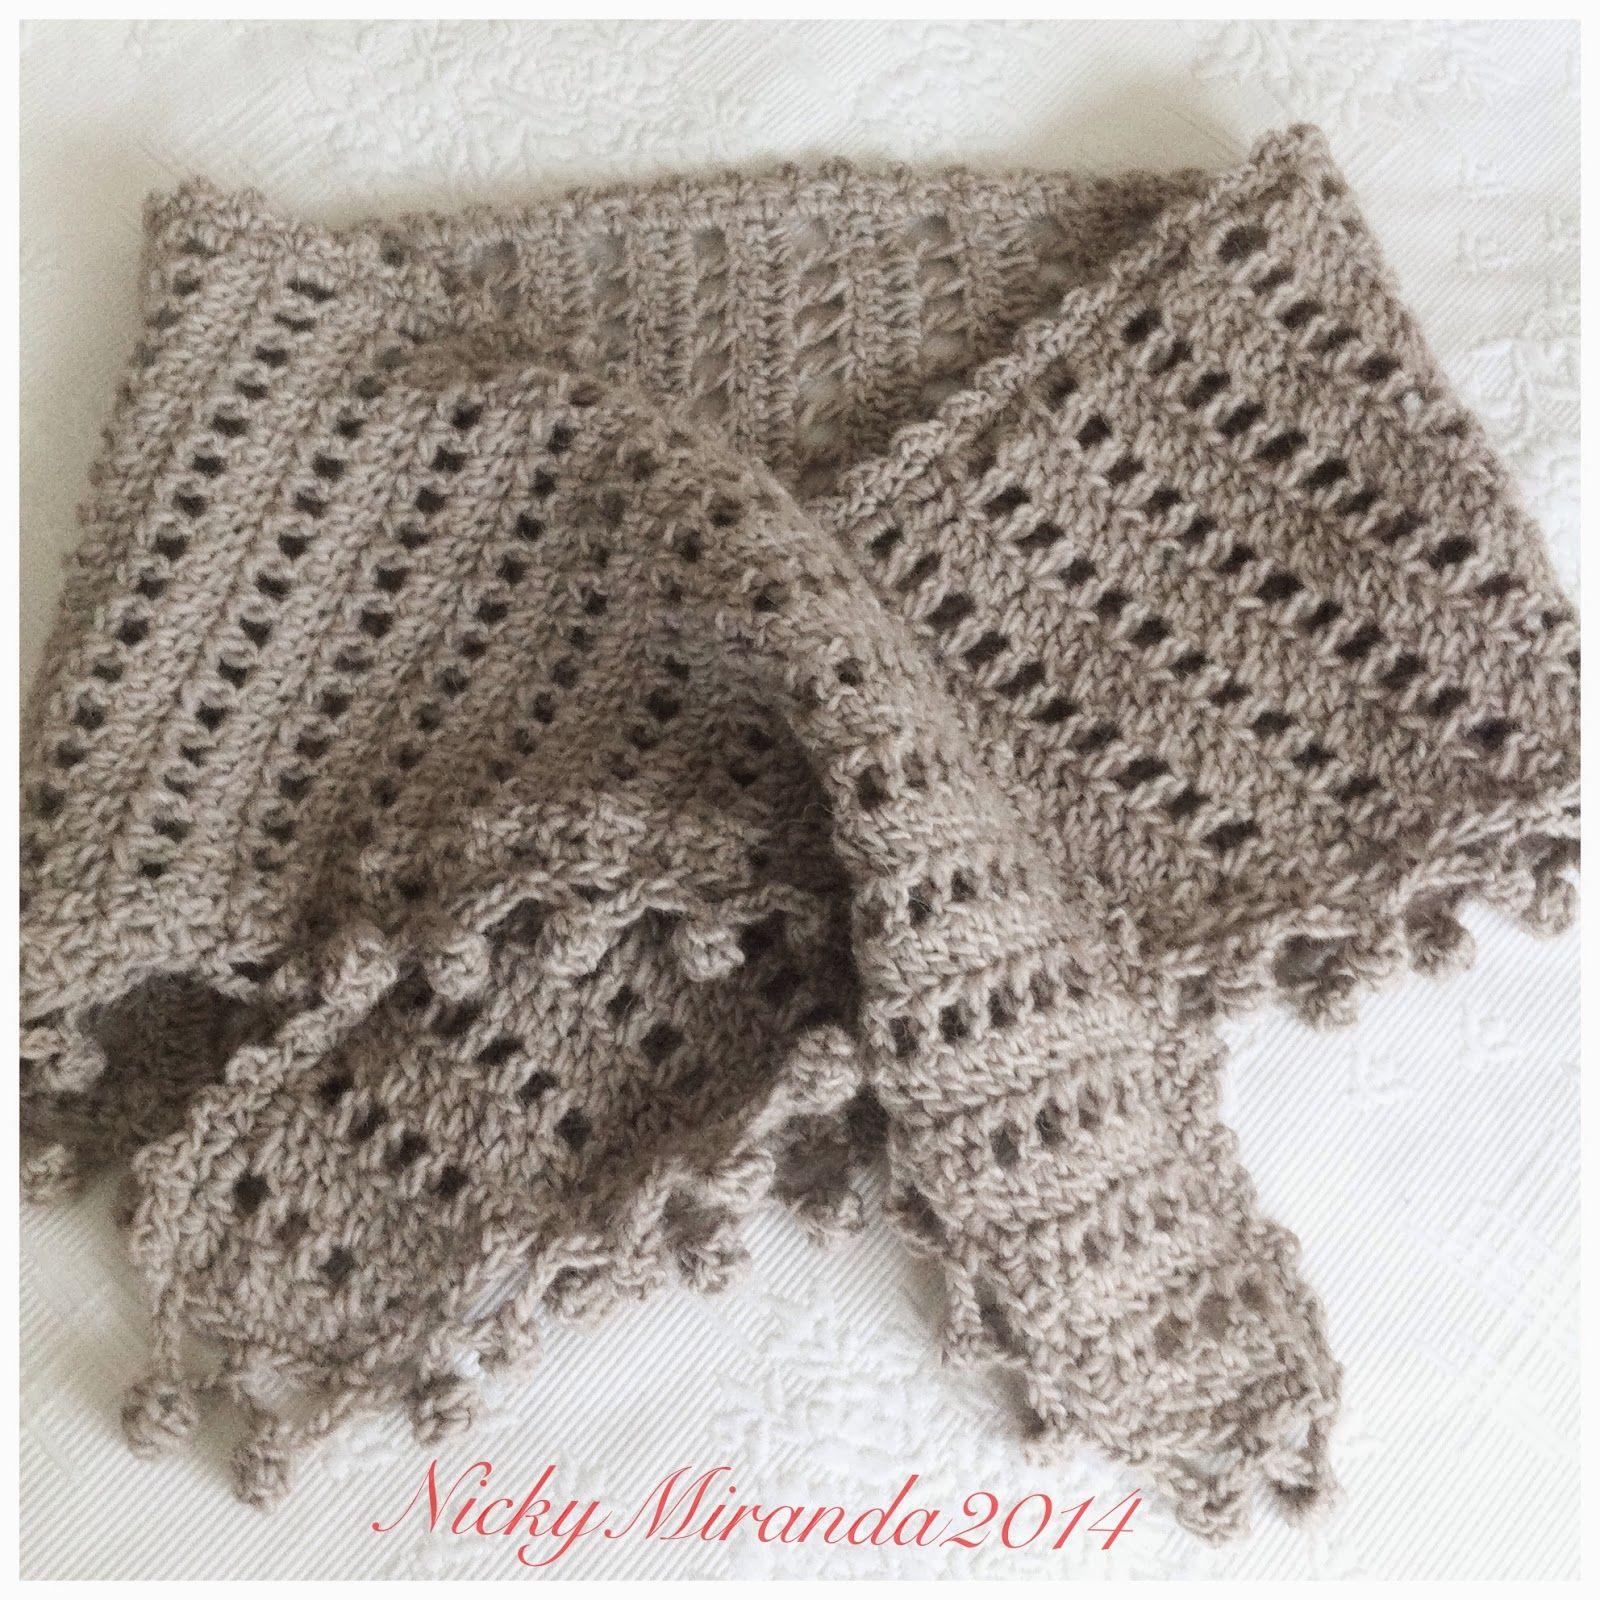 Pin By Jan Warner On Mlw Pinterest Crochet Crochet Patterns And